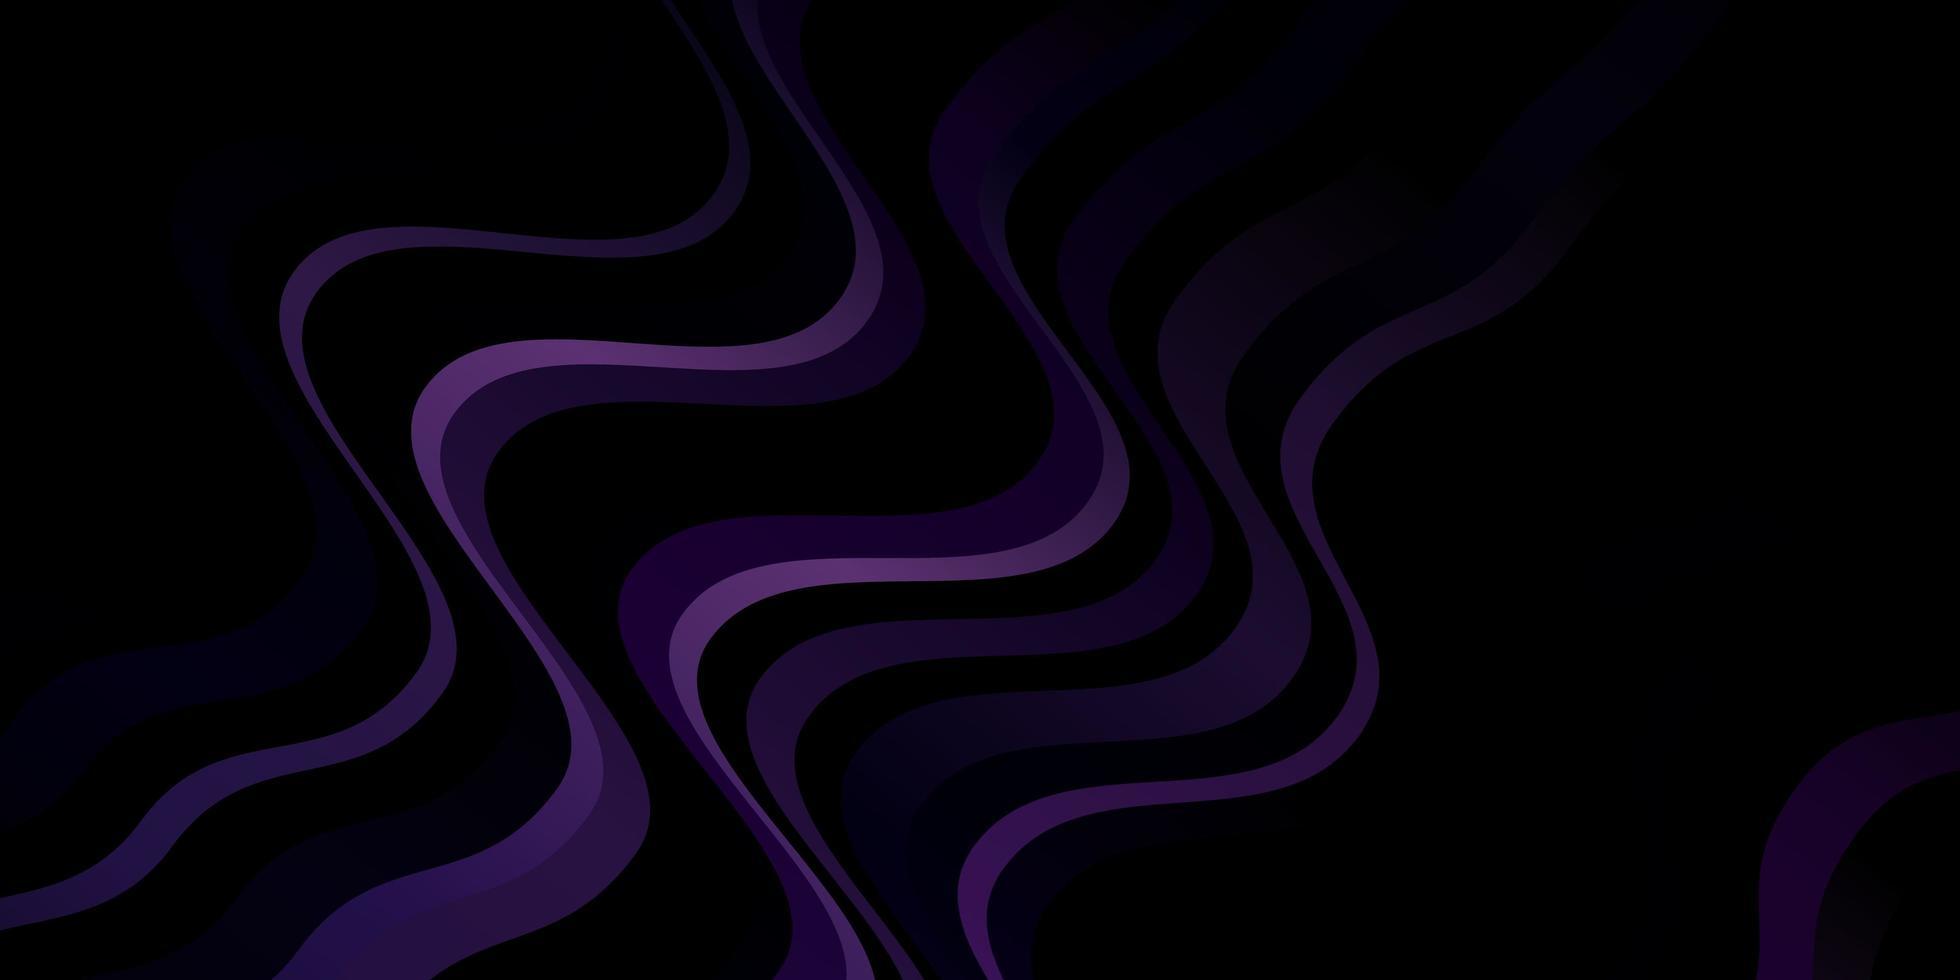 pano de fundo roxo escuro com curvas. vetor